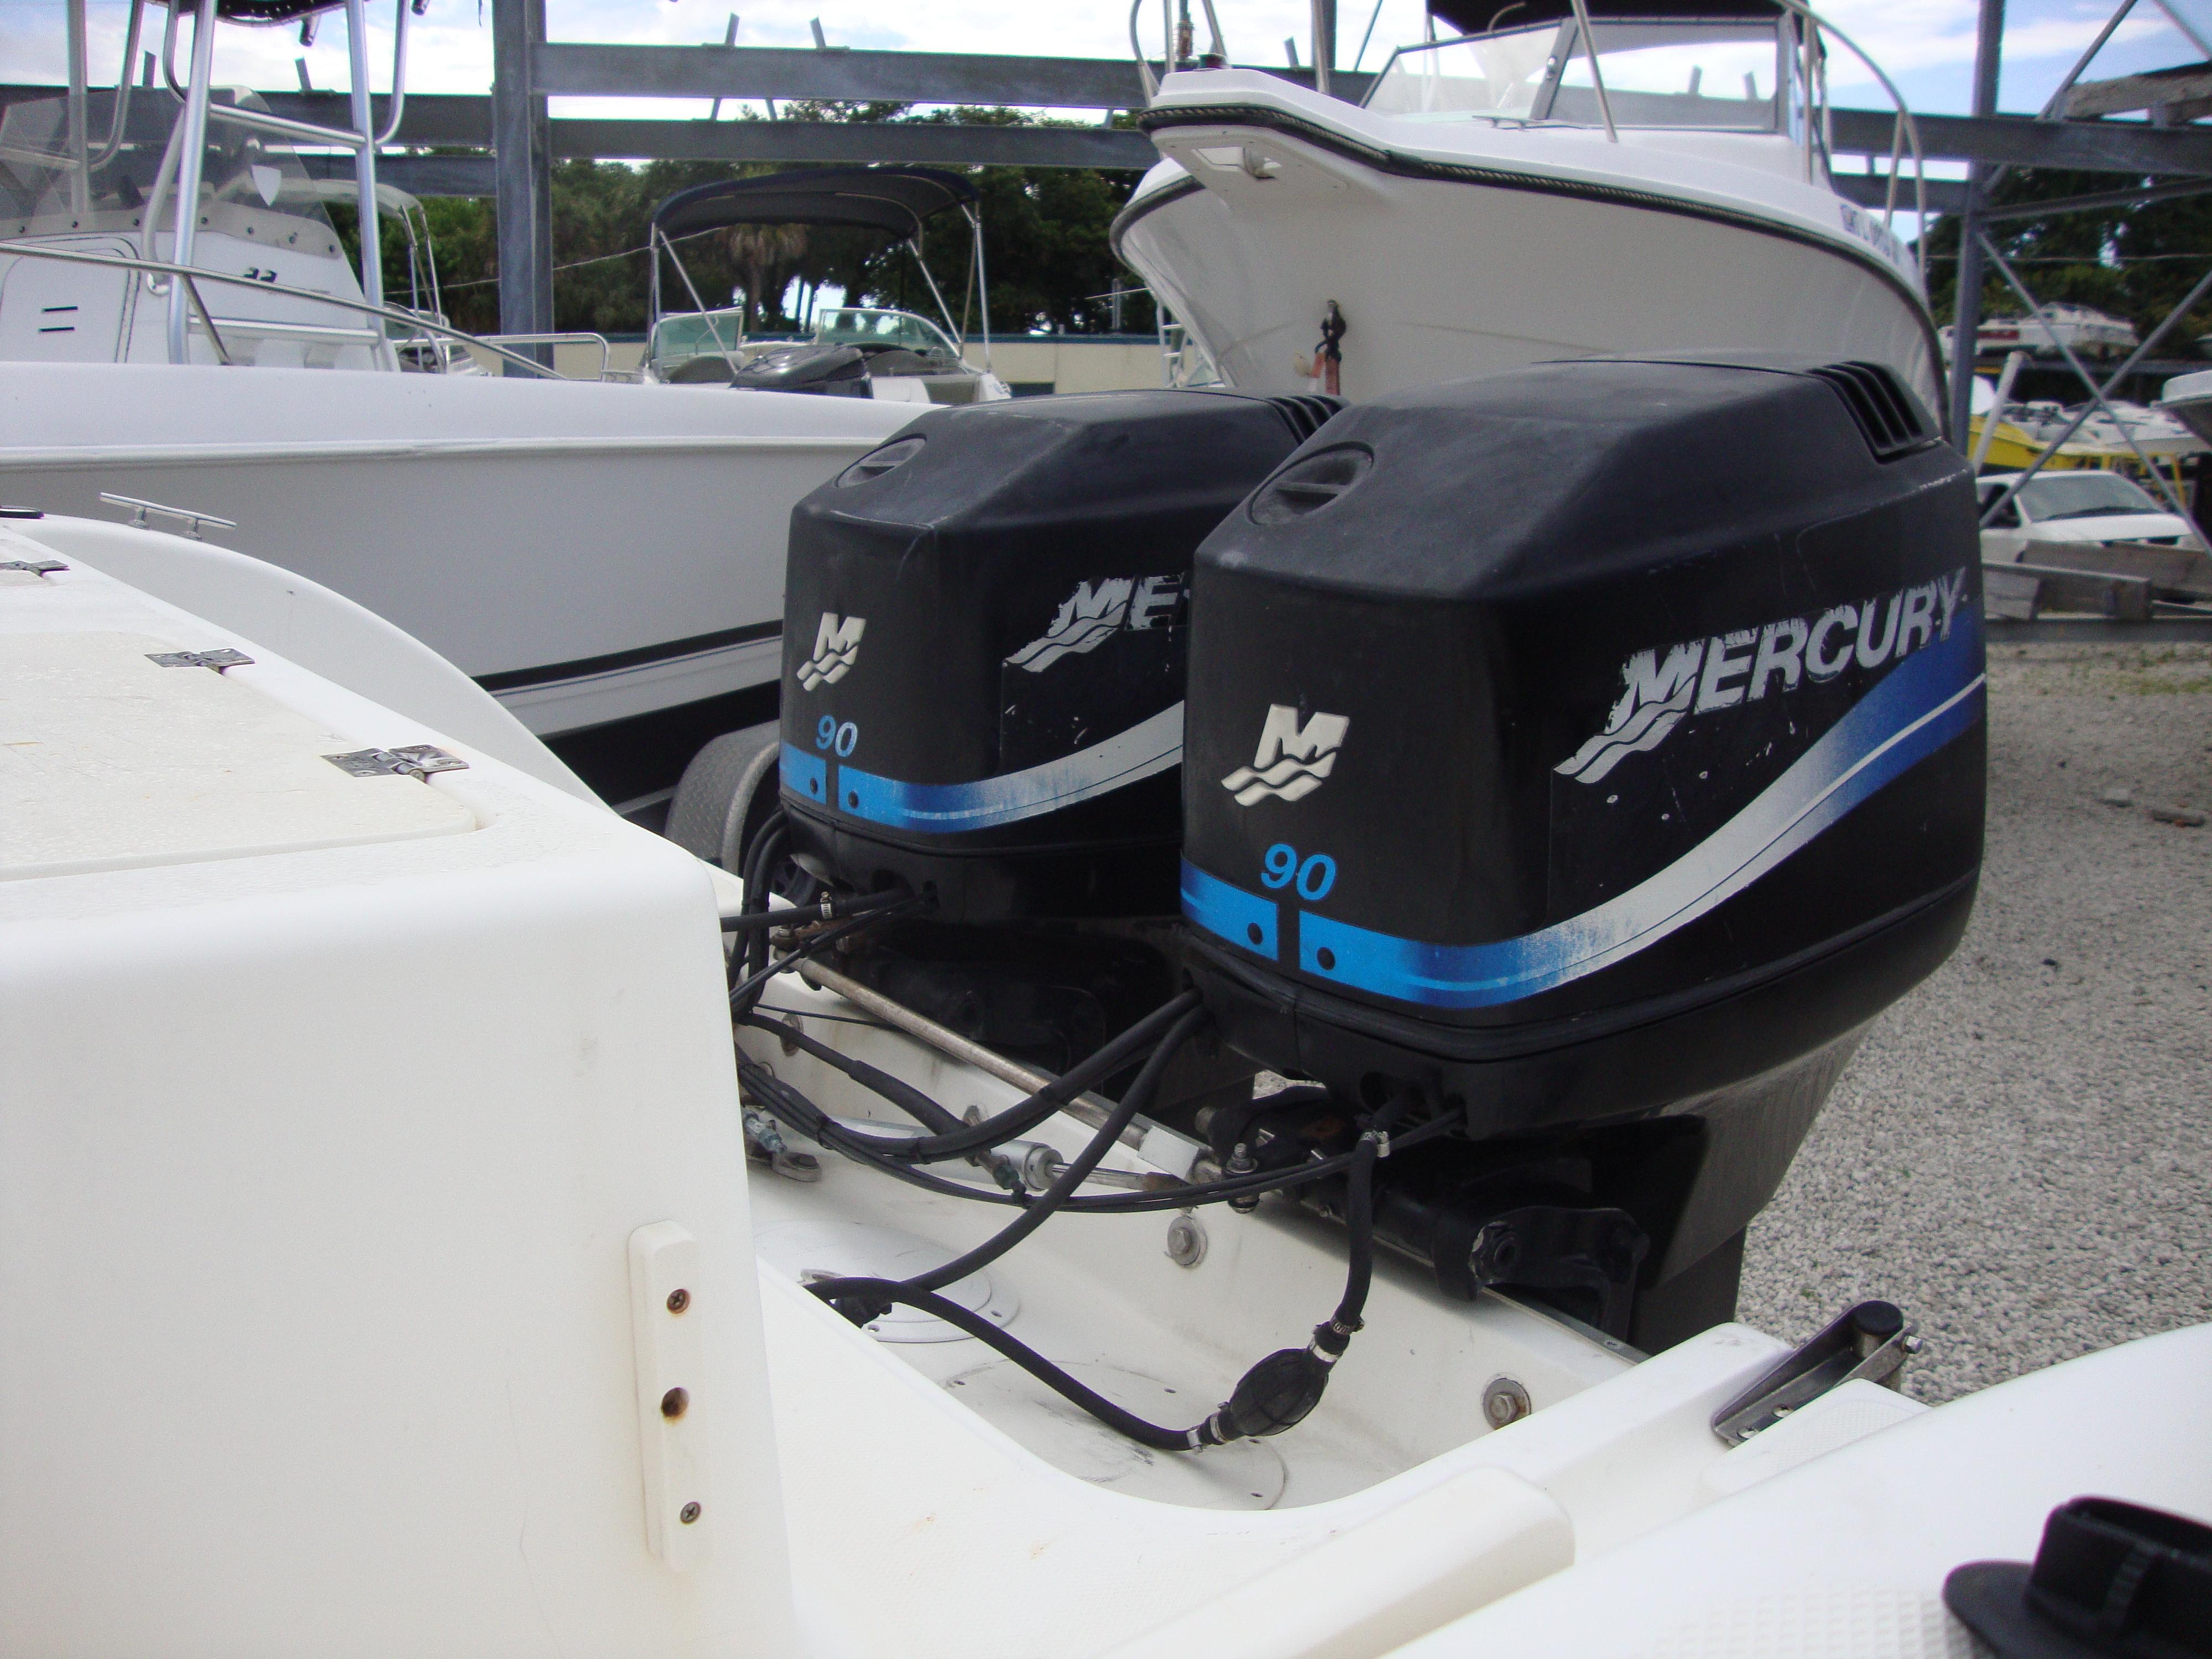 2002 Sea Fox 230 WA 24 Walkaround Used -Good - AvidBoater com